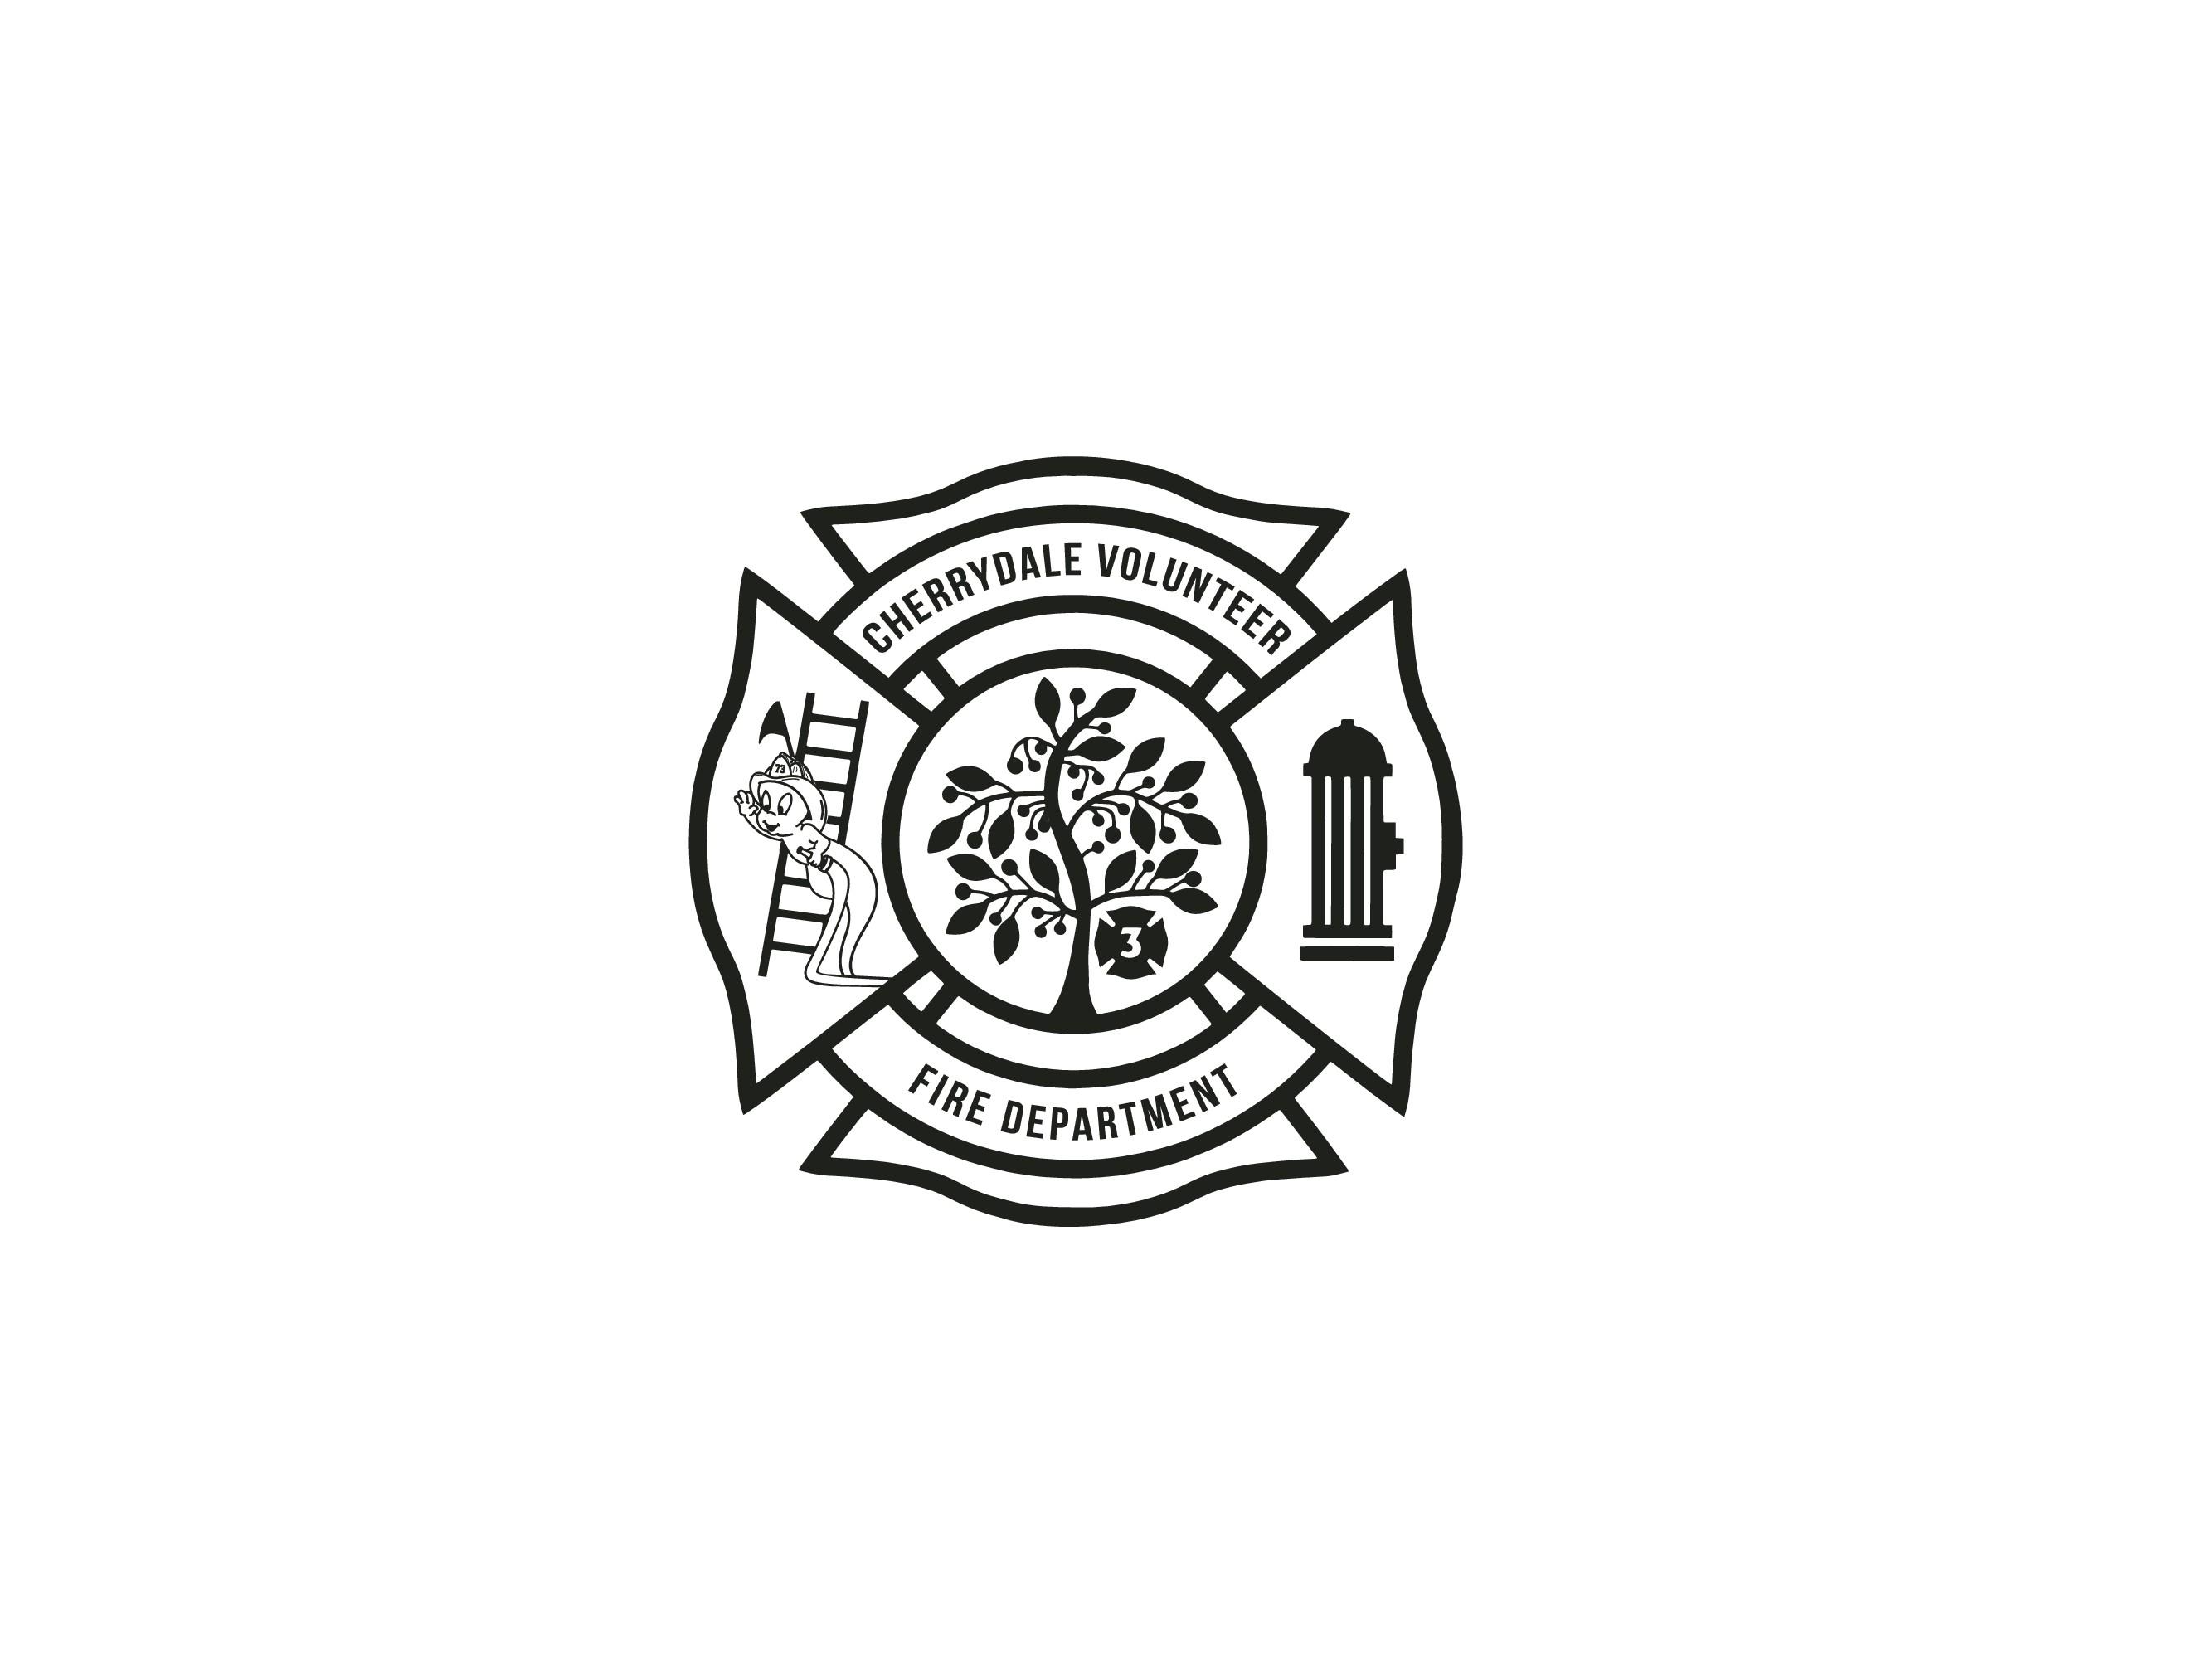 Fire Department/Casper